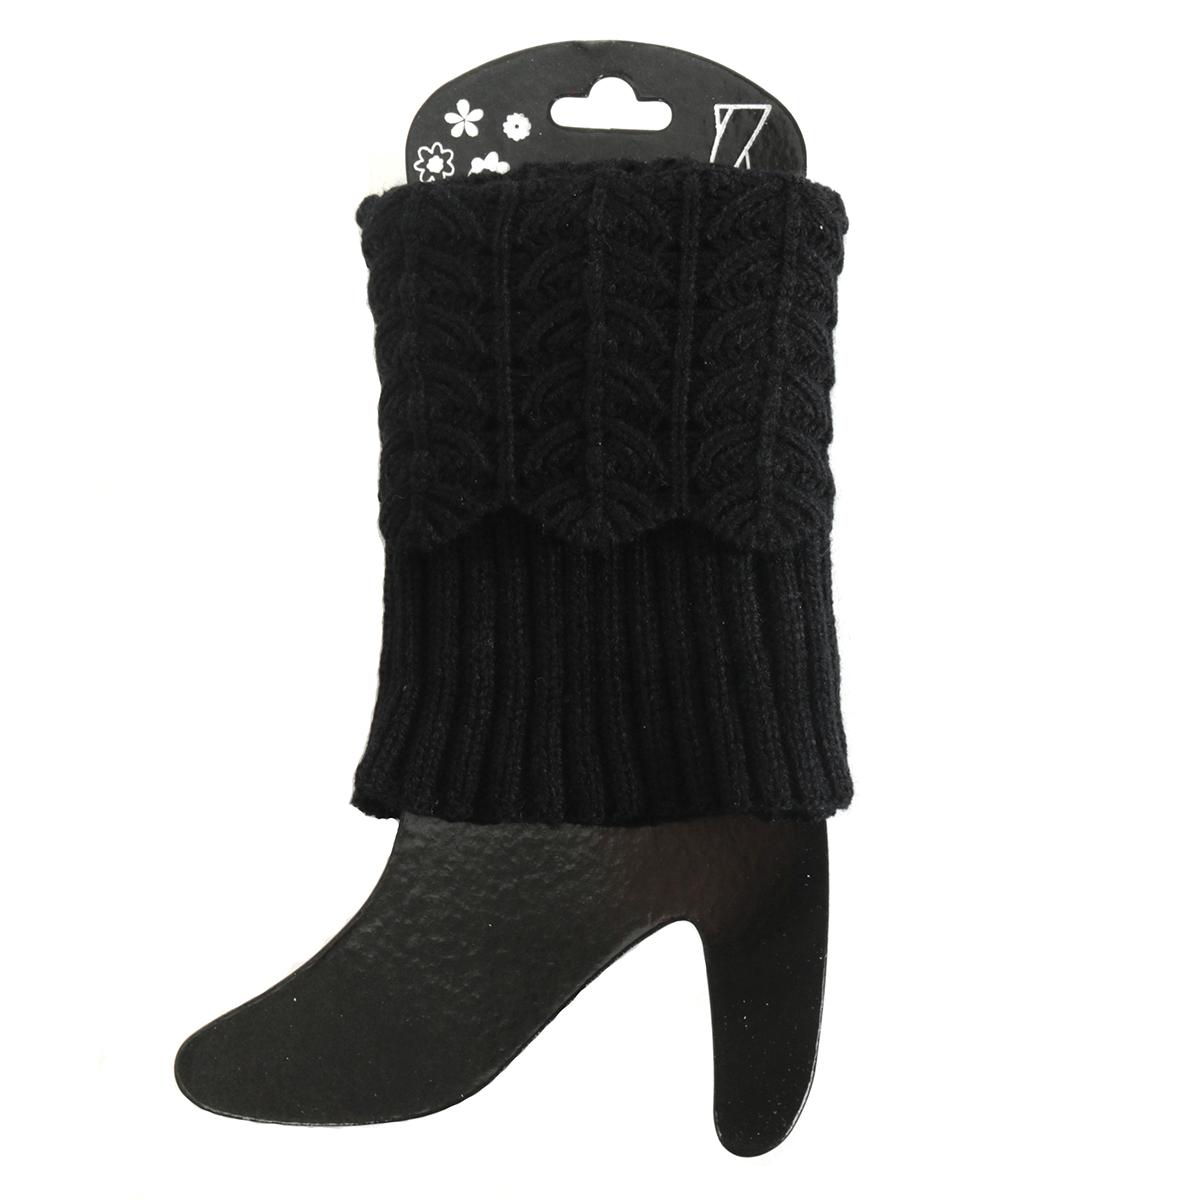 Black Crochet Boot Cuff Short